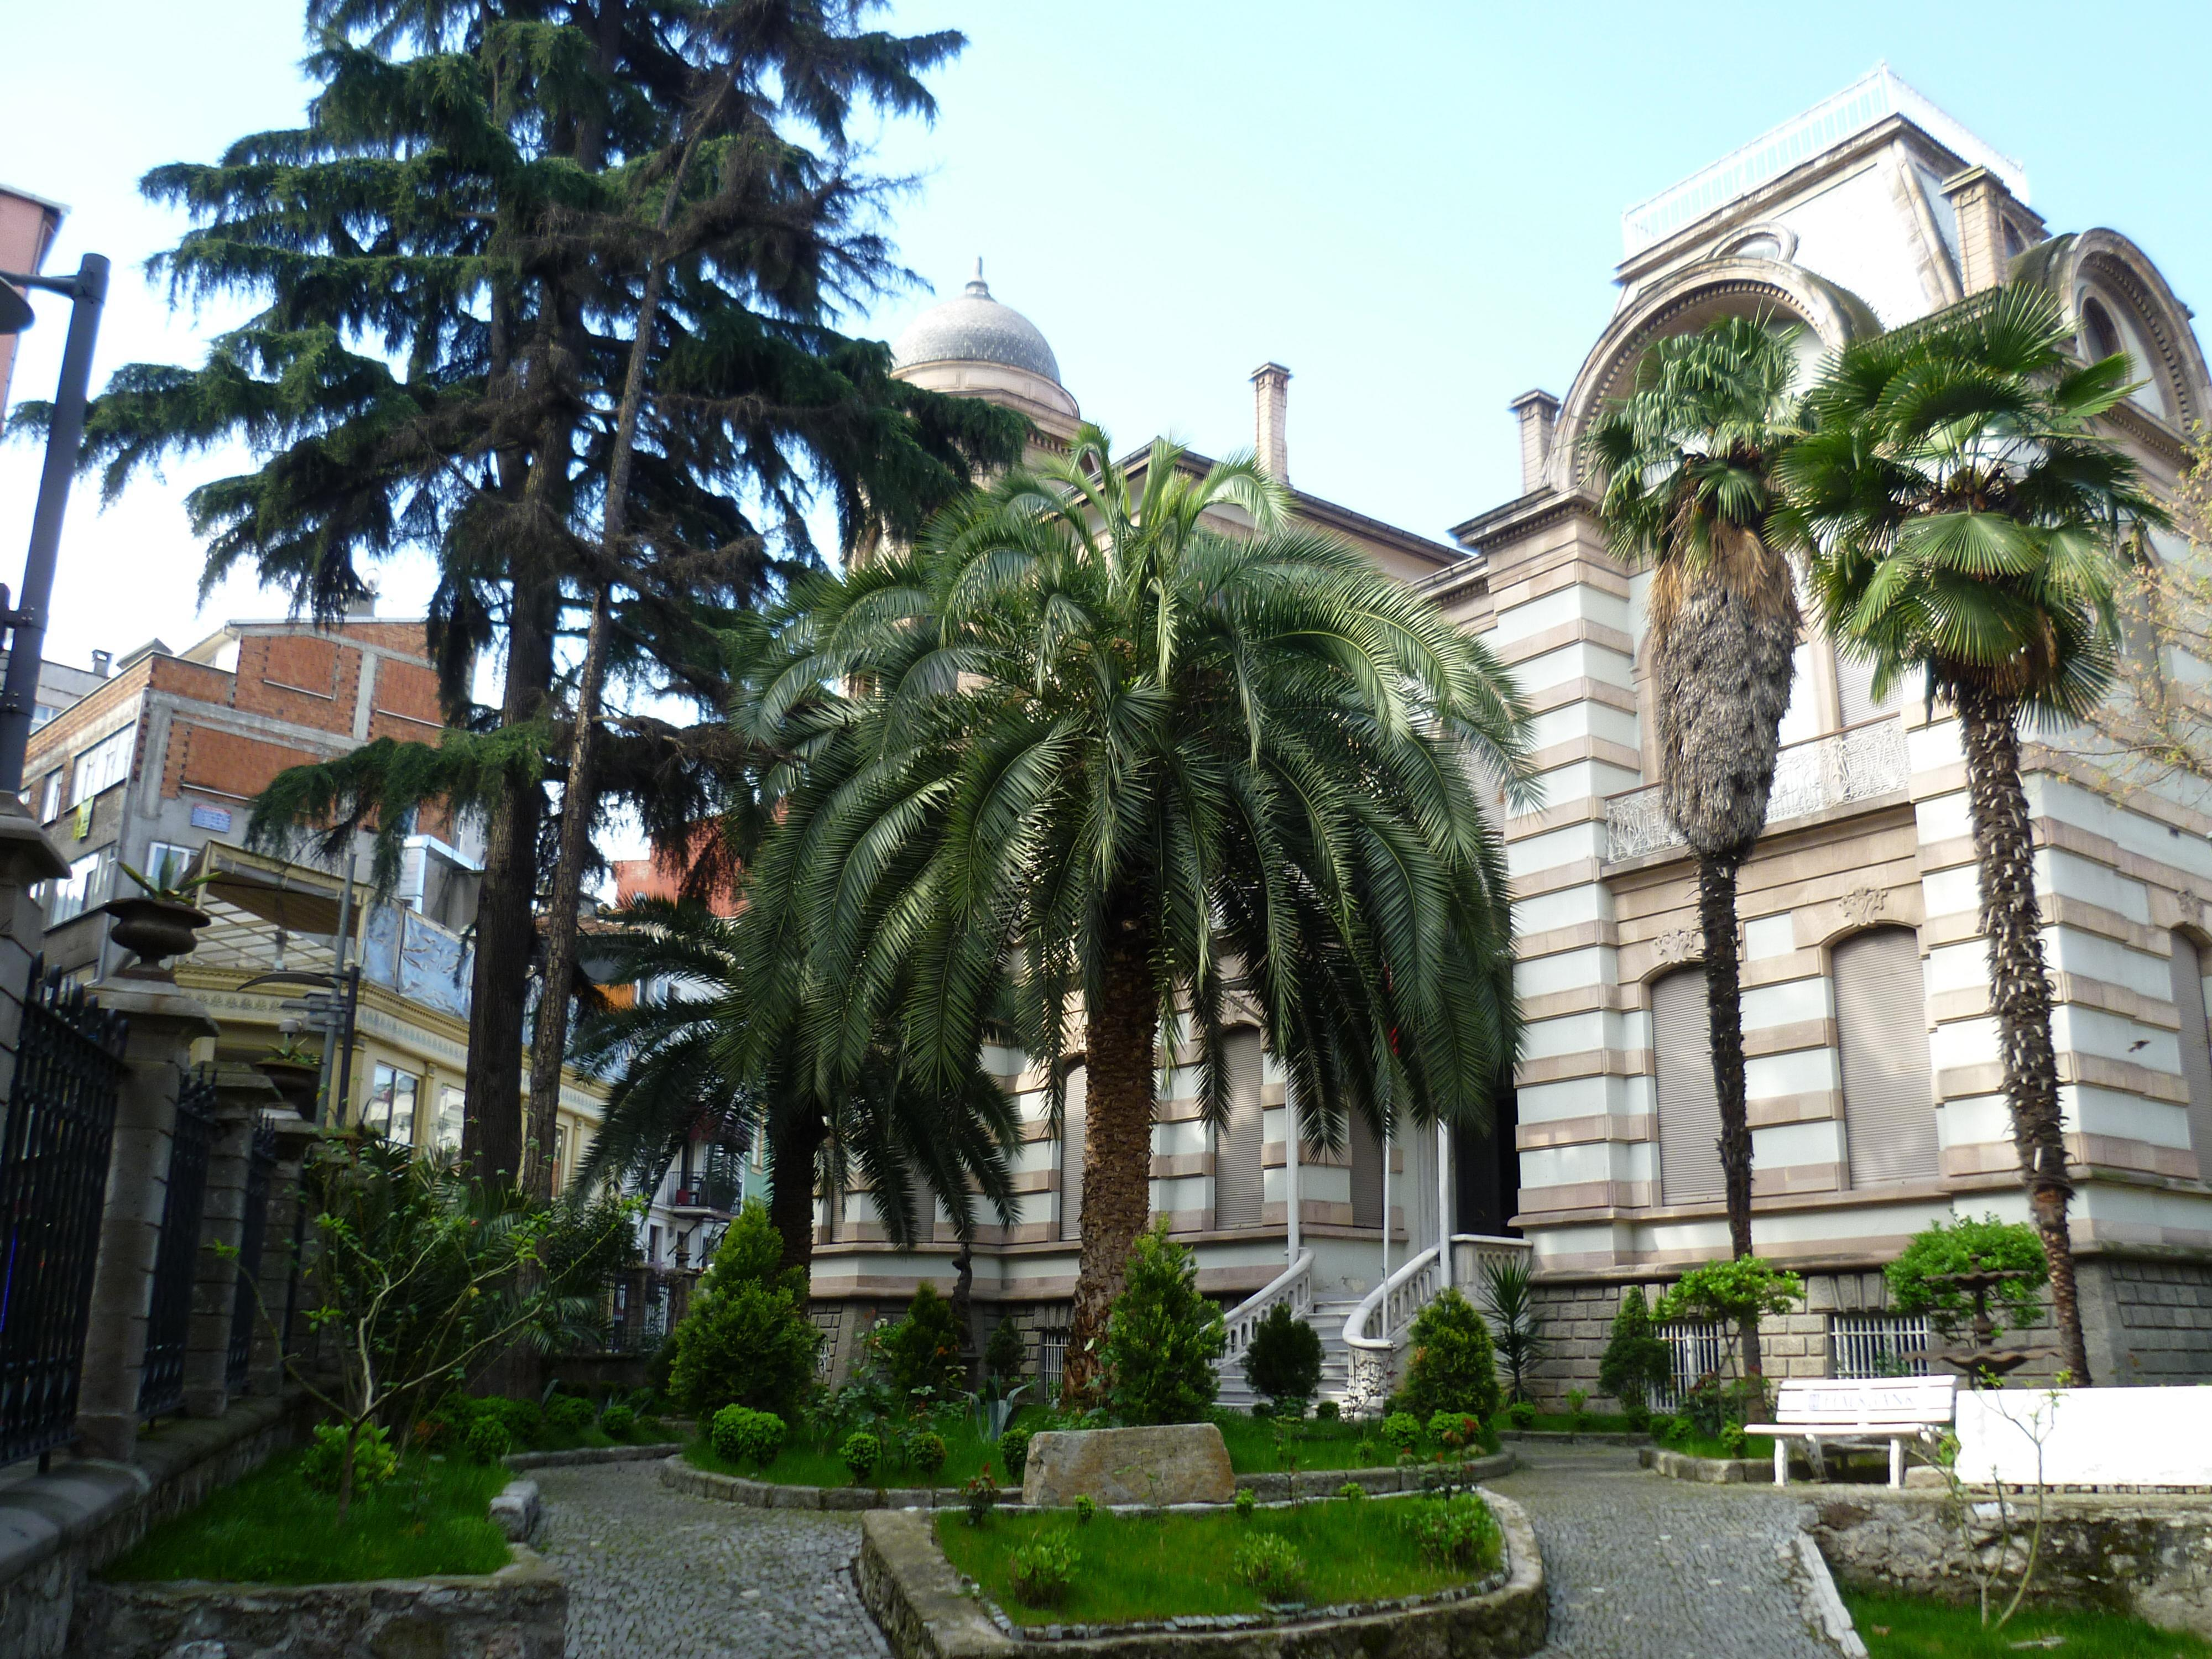 File:Trabzon museum.jpg - Wikimedia Commons